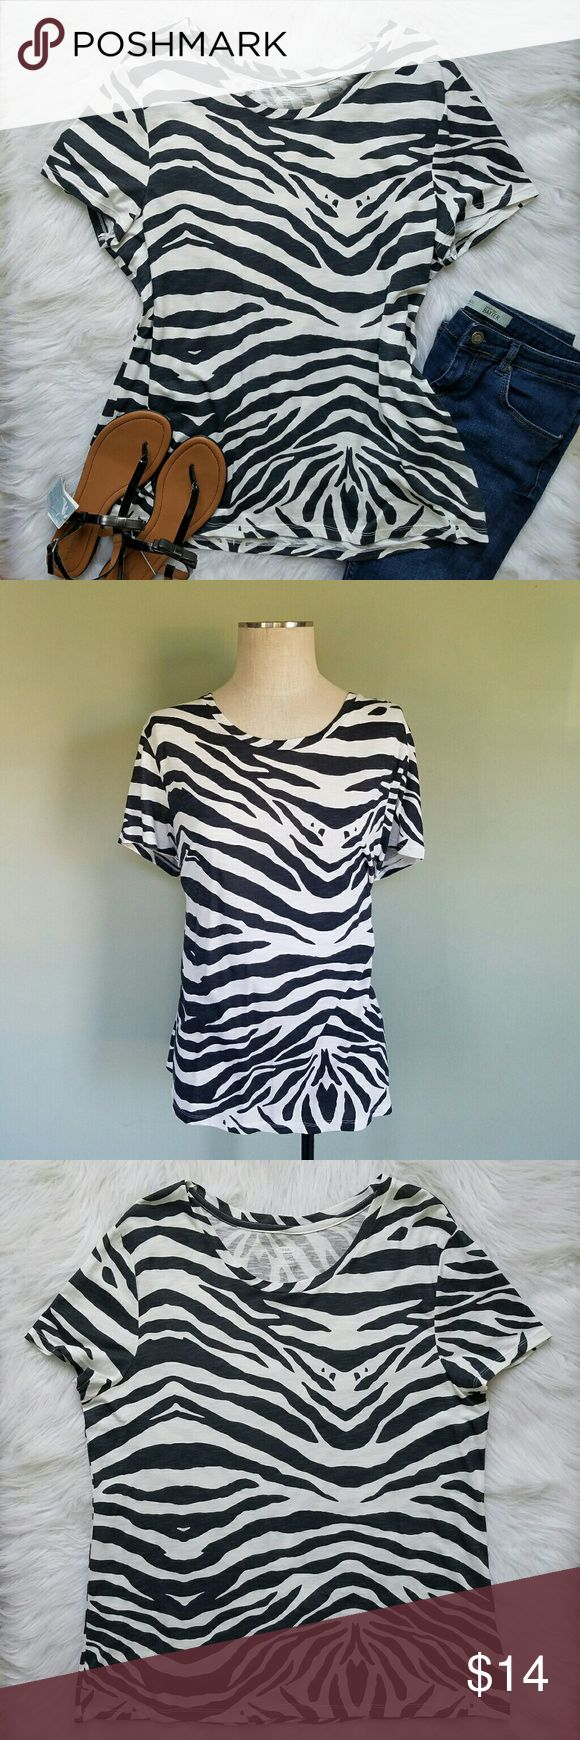 Black t shirt old navy - Old Navy Zebra Print Tshirt Nwt